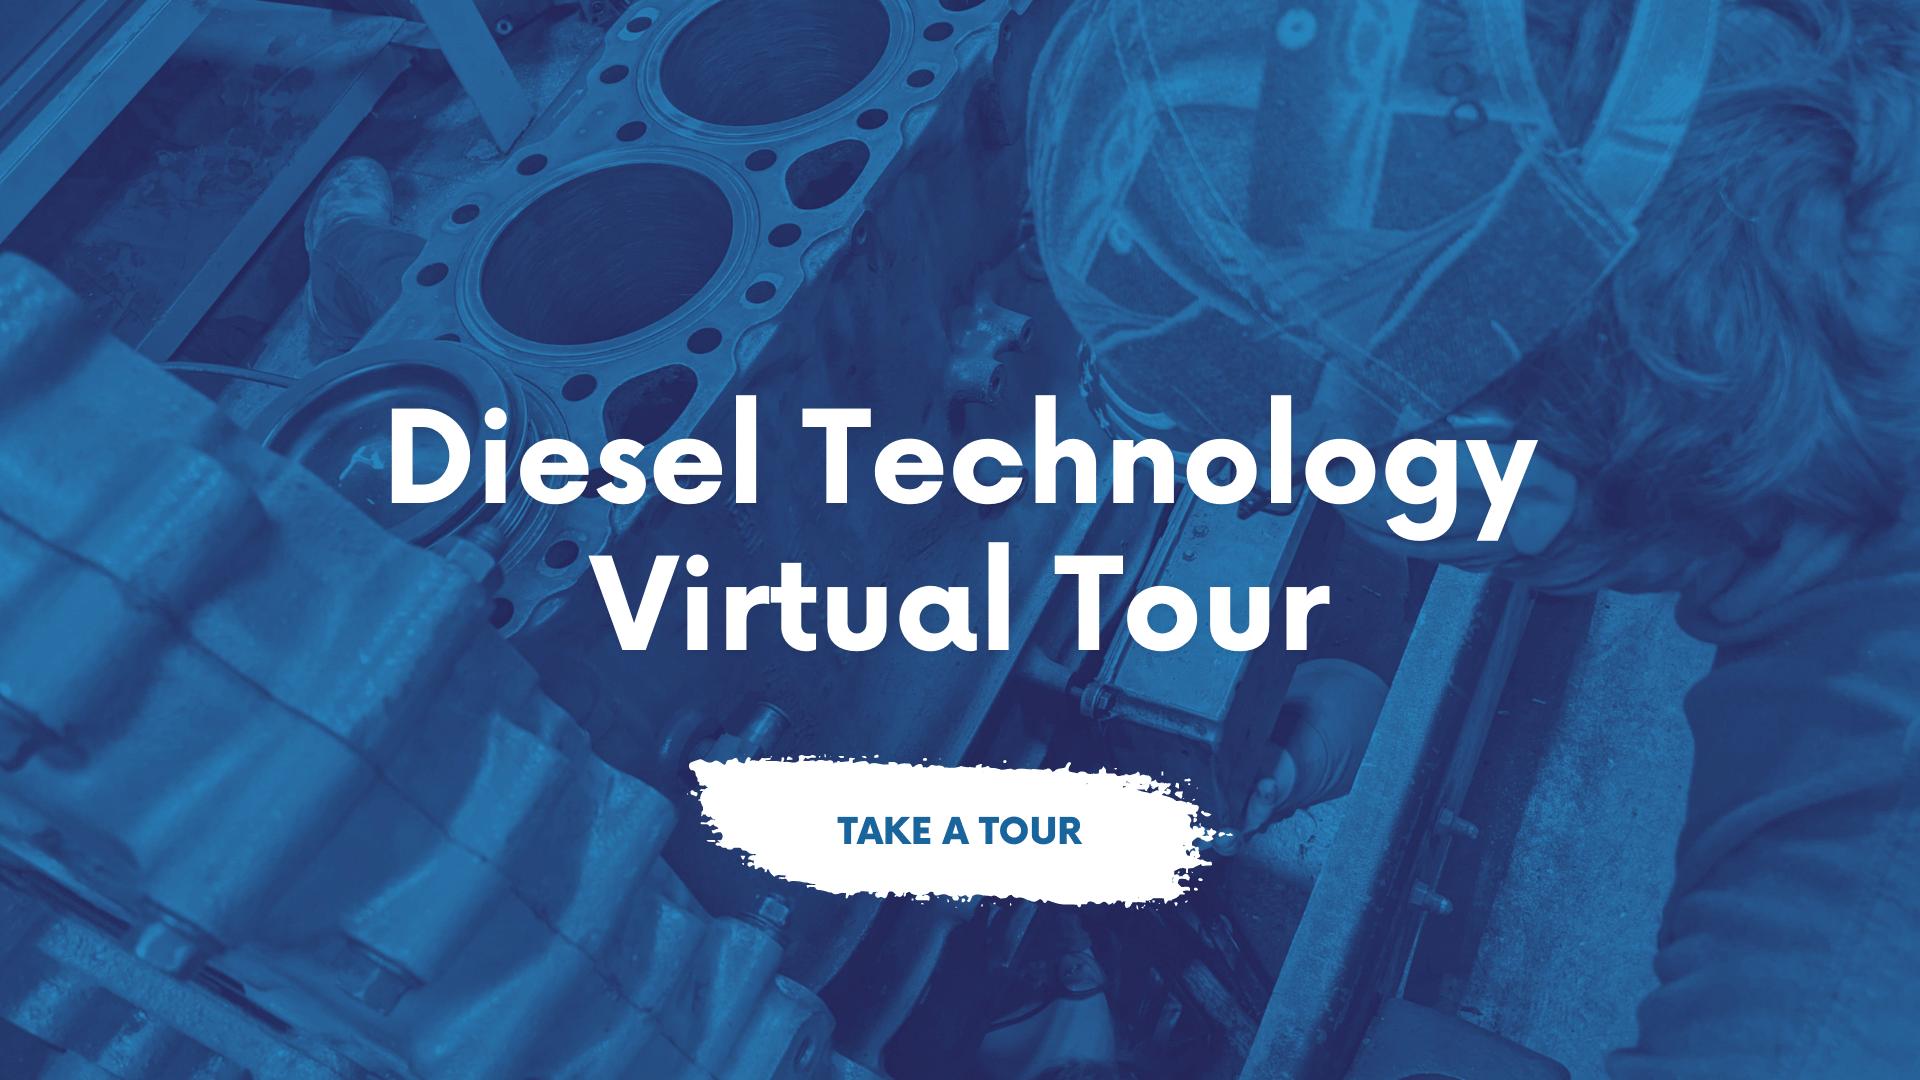 Diesel Technology Virtual Tour